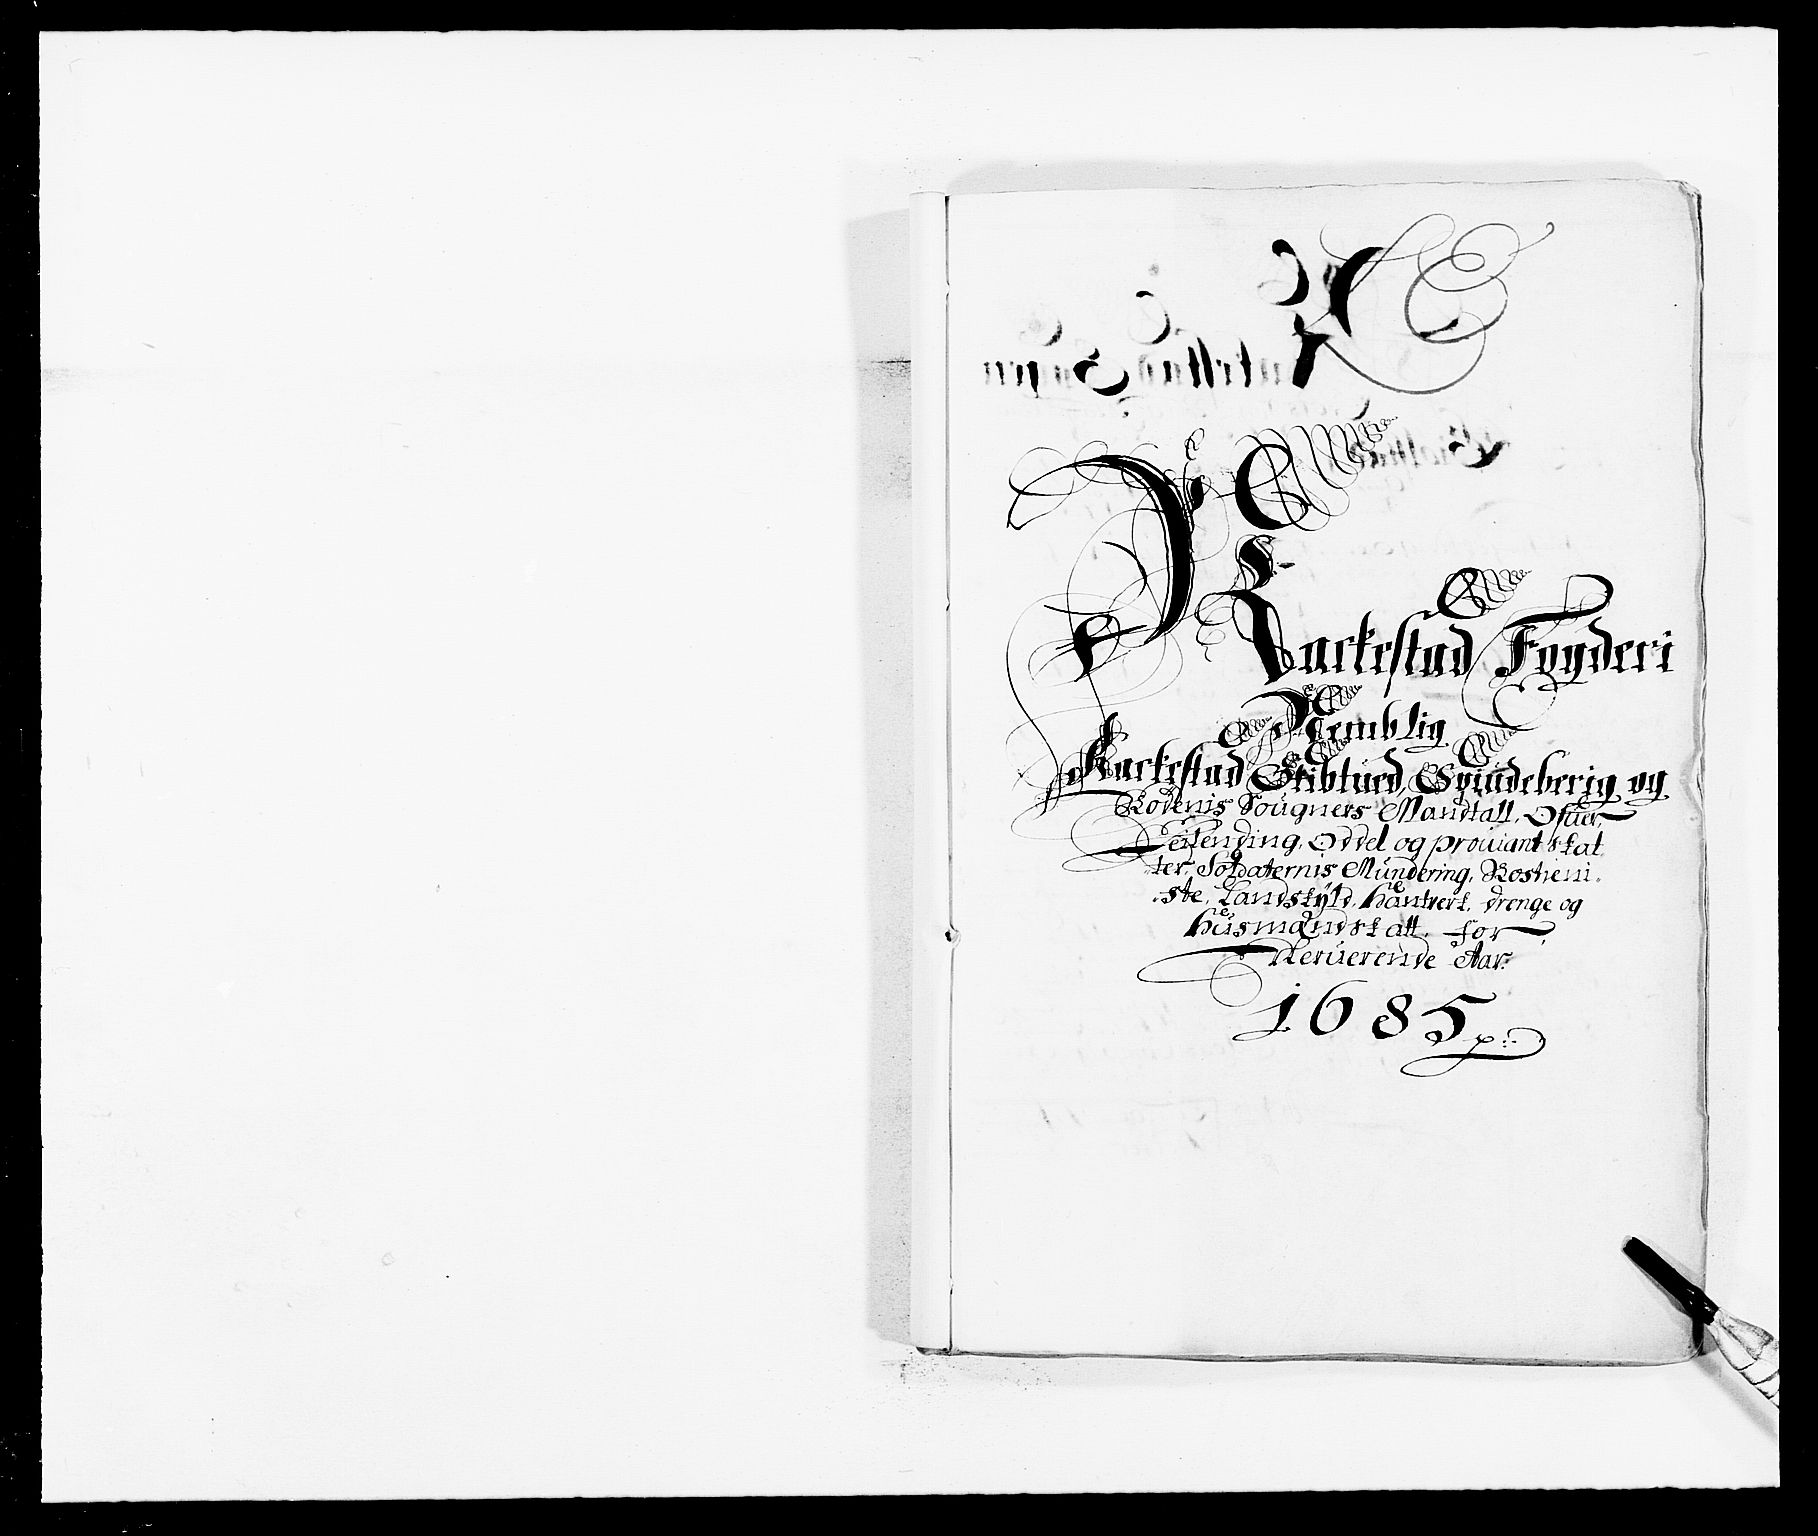 RA, Rentekammeret inntil 1814, Reviderte regnskaper, Fogderegnskap, R05/L0275: Fogderegnskap Rakkestad, 1685-1686, s. 60